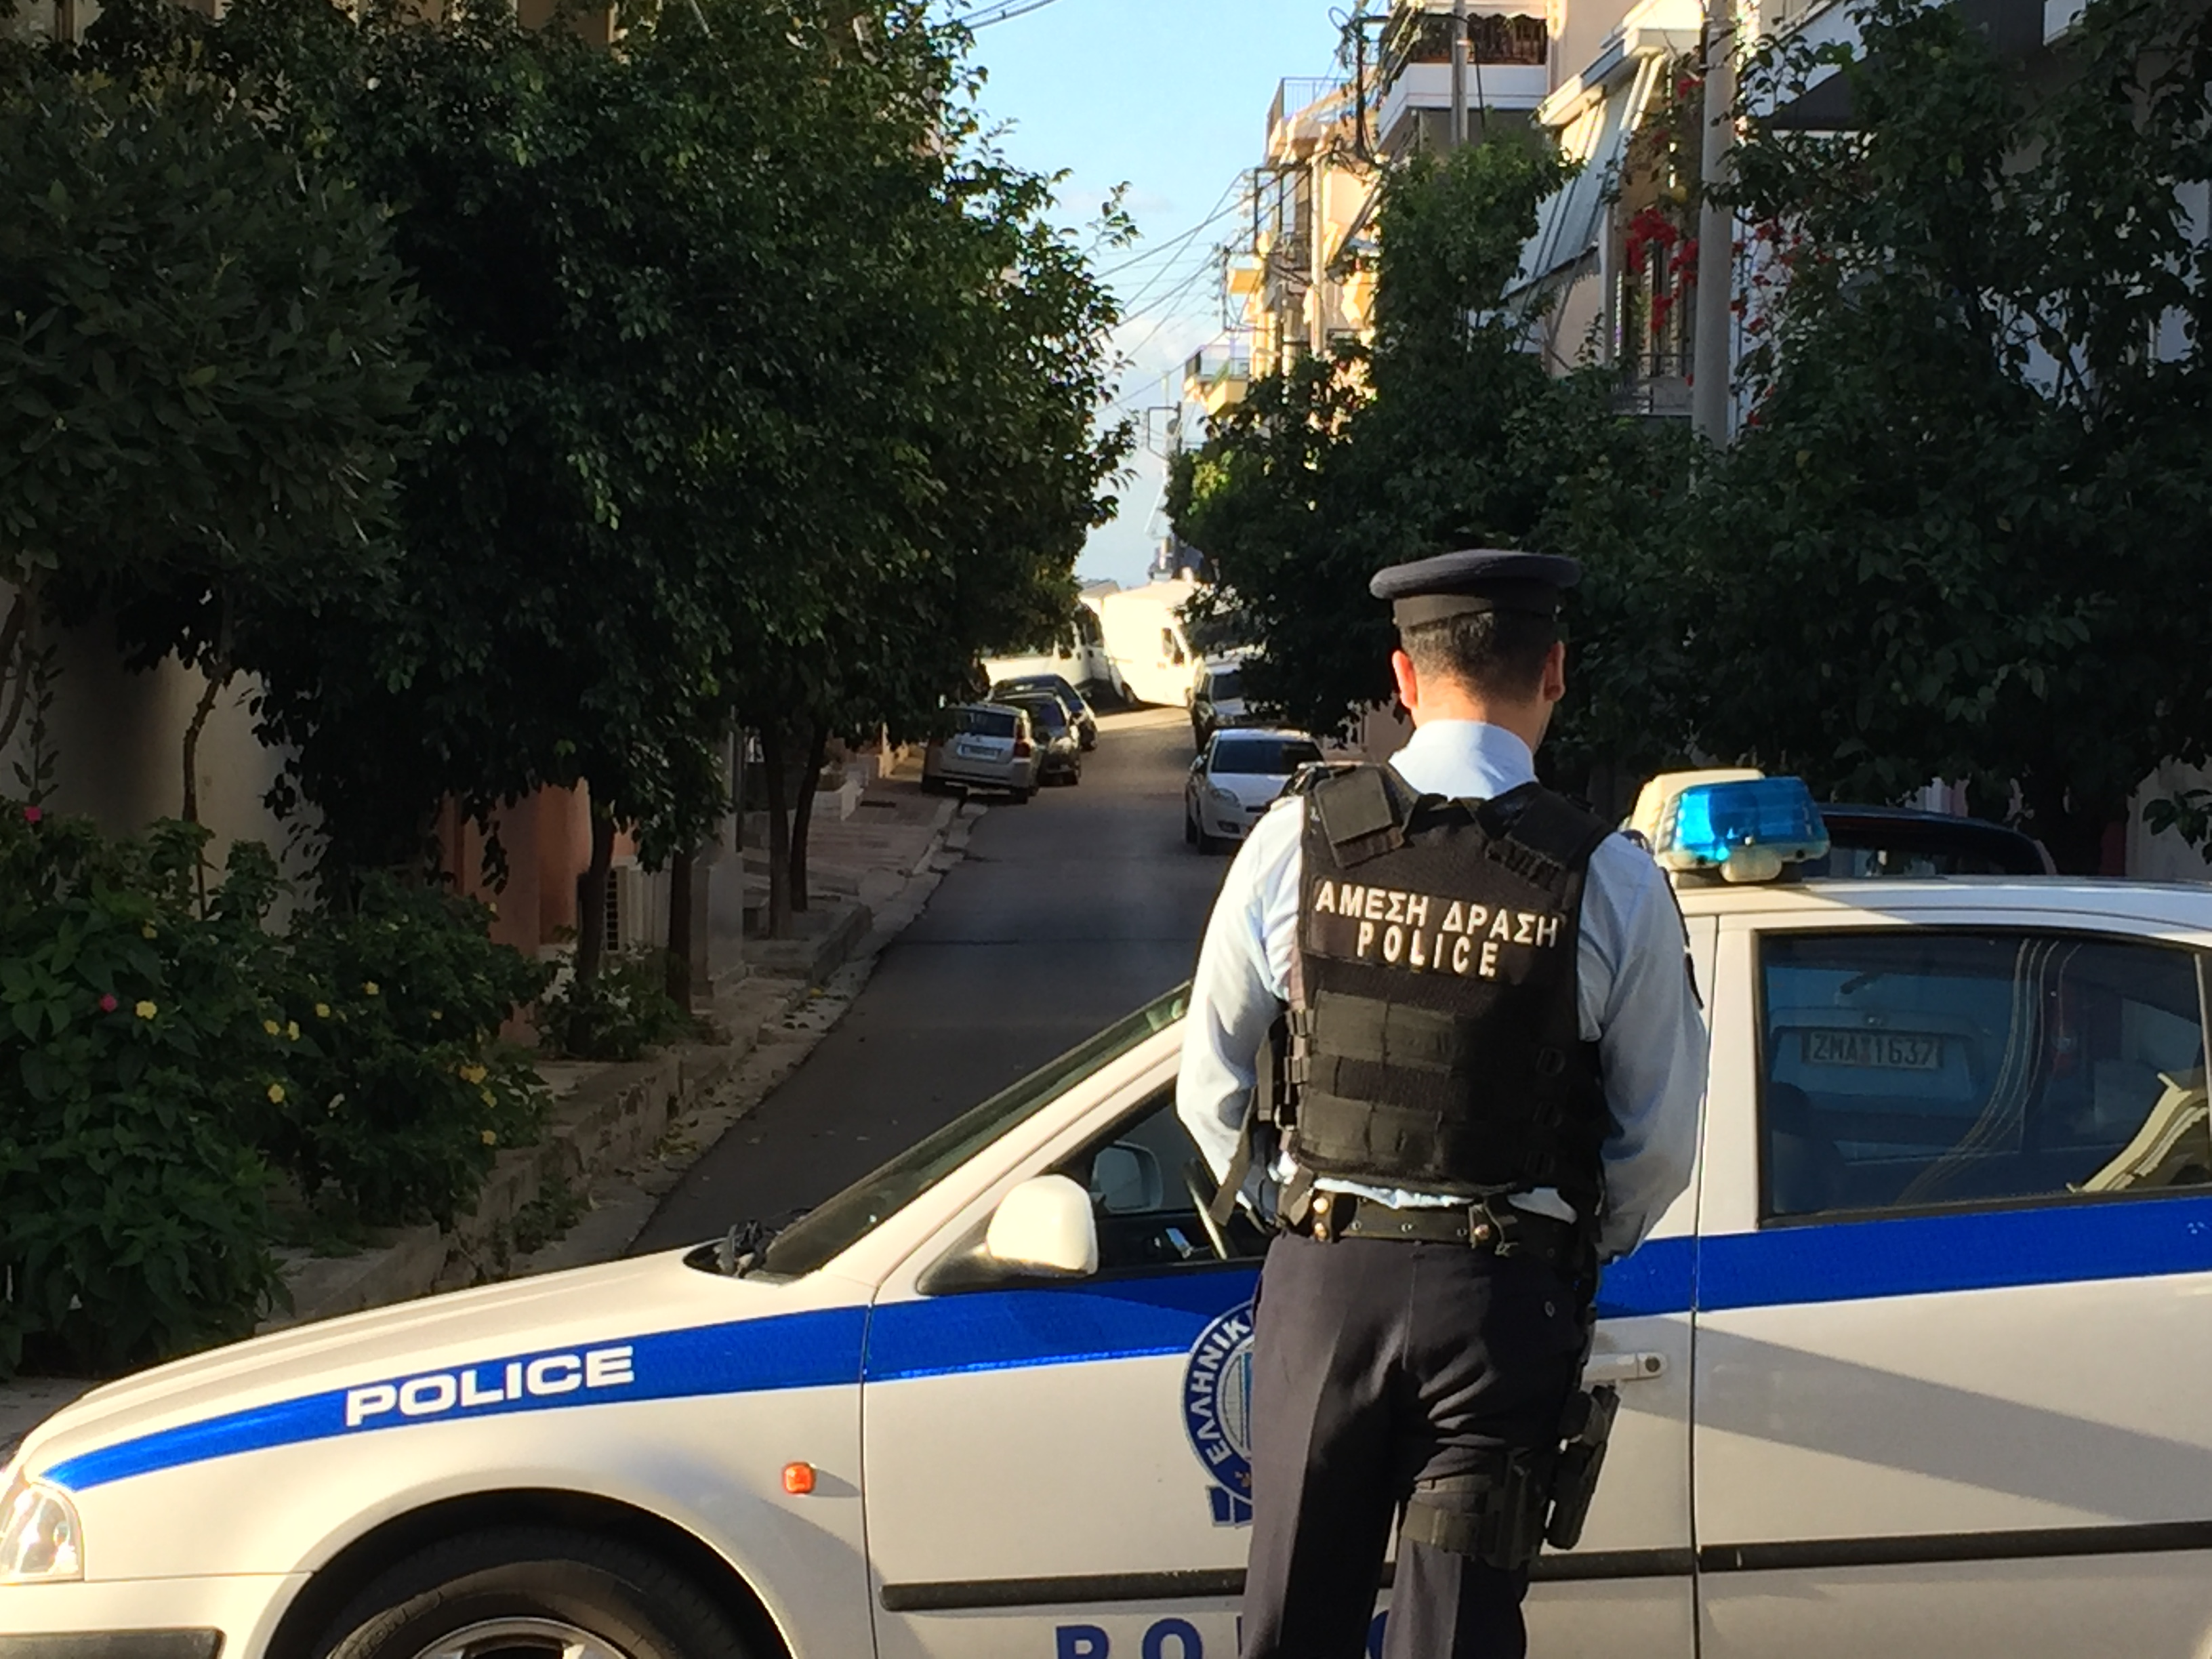 1496d2c0d2 Συναγερμός τη νύχτα από βόμβα έξω στο σπίτι του αντεισαγγελέα του Αρείου  Πάγου Ισίδωρου Ντογιάκου